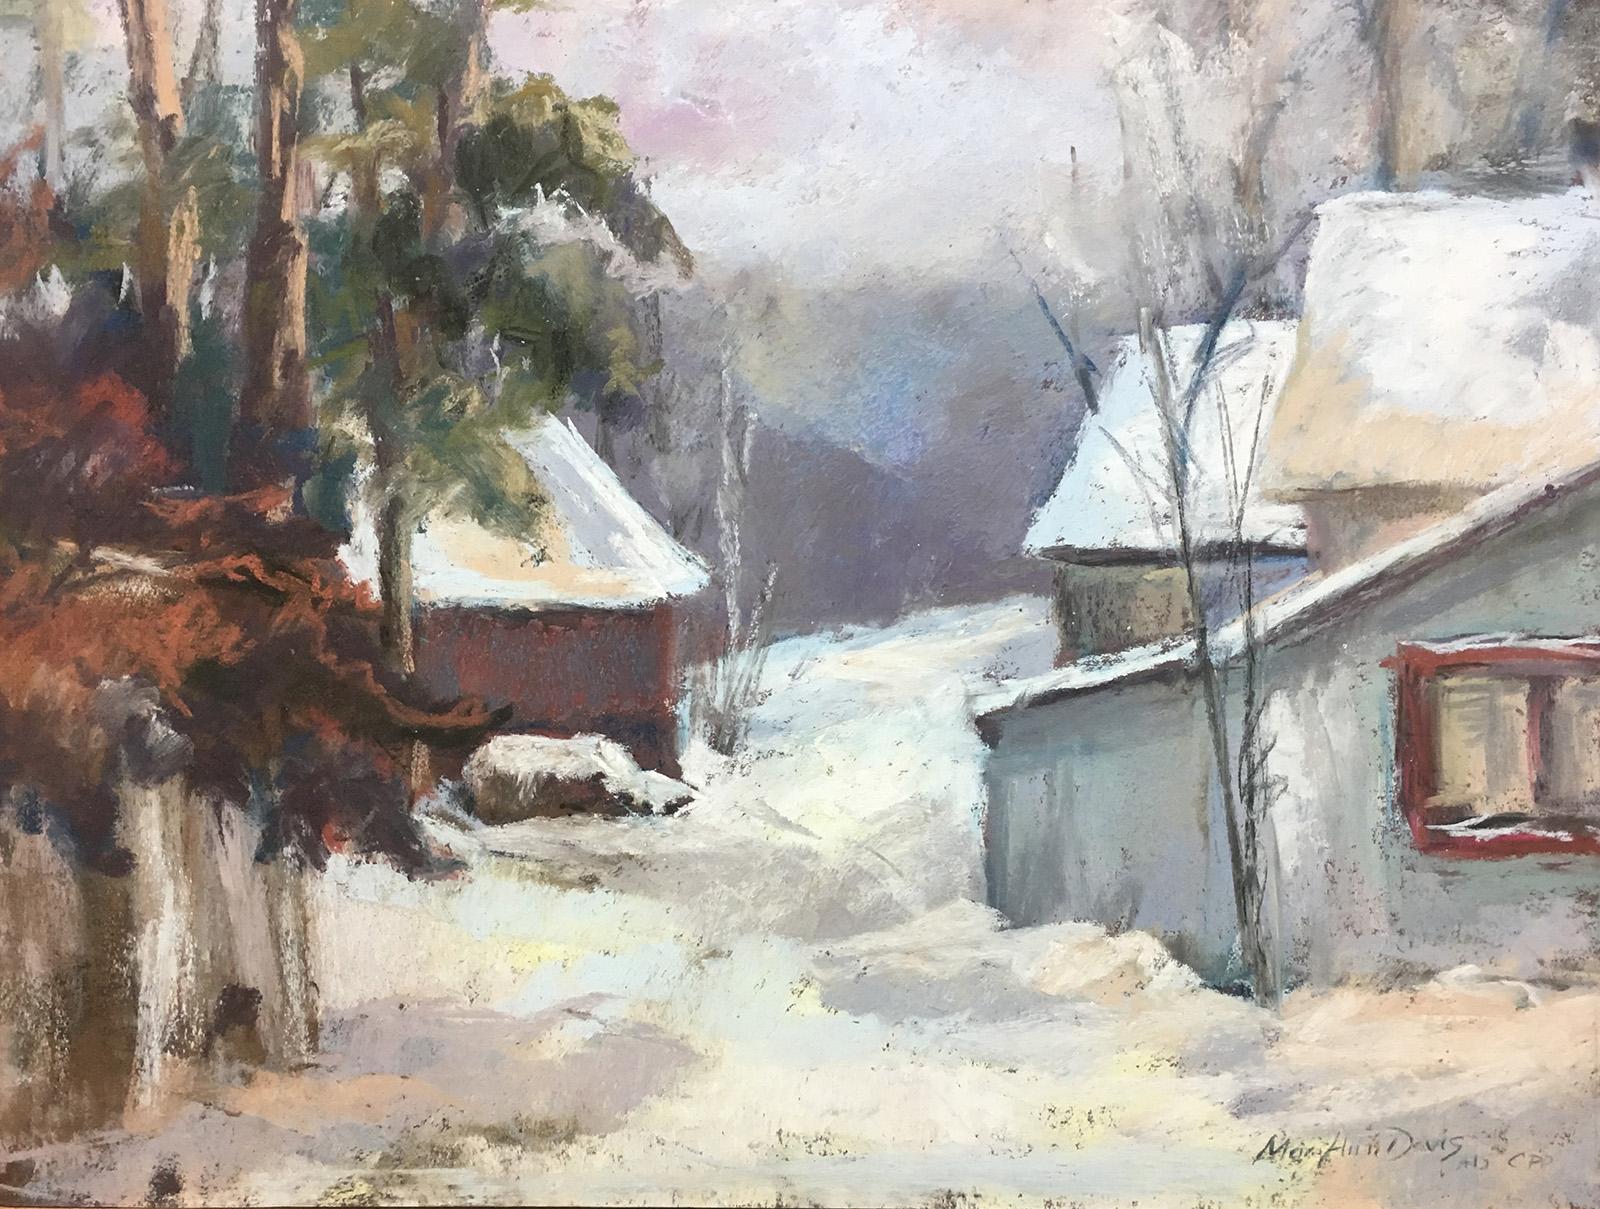 Mary Ann Davis - Waycross Snow Scene.jpg